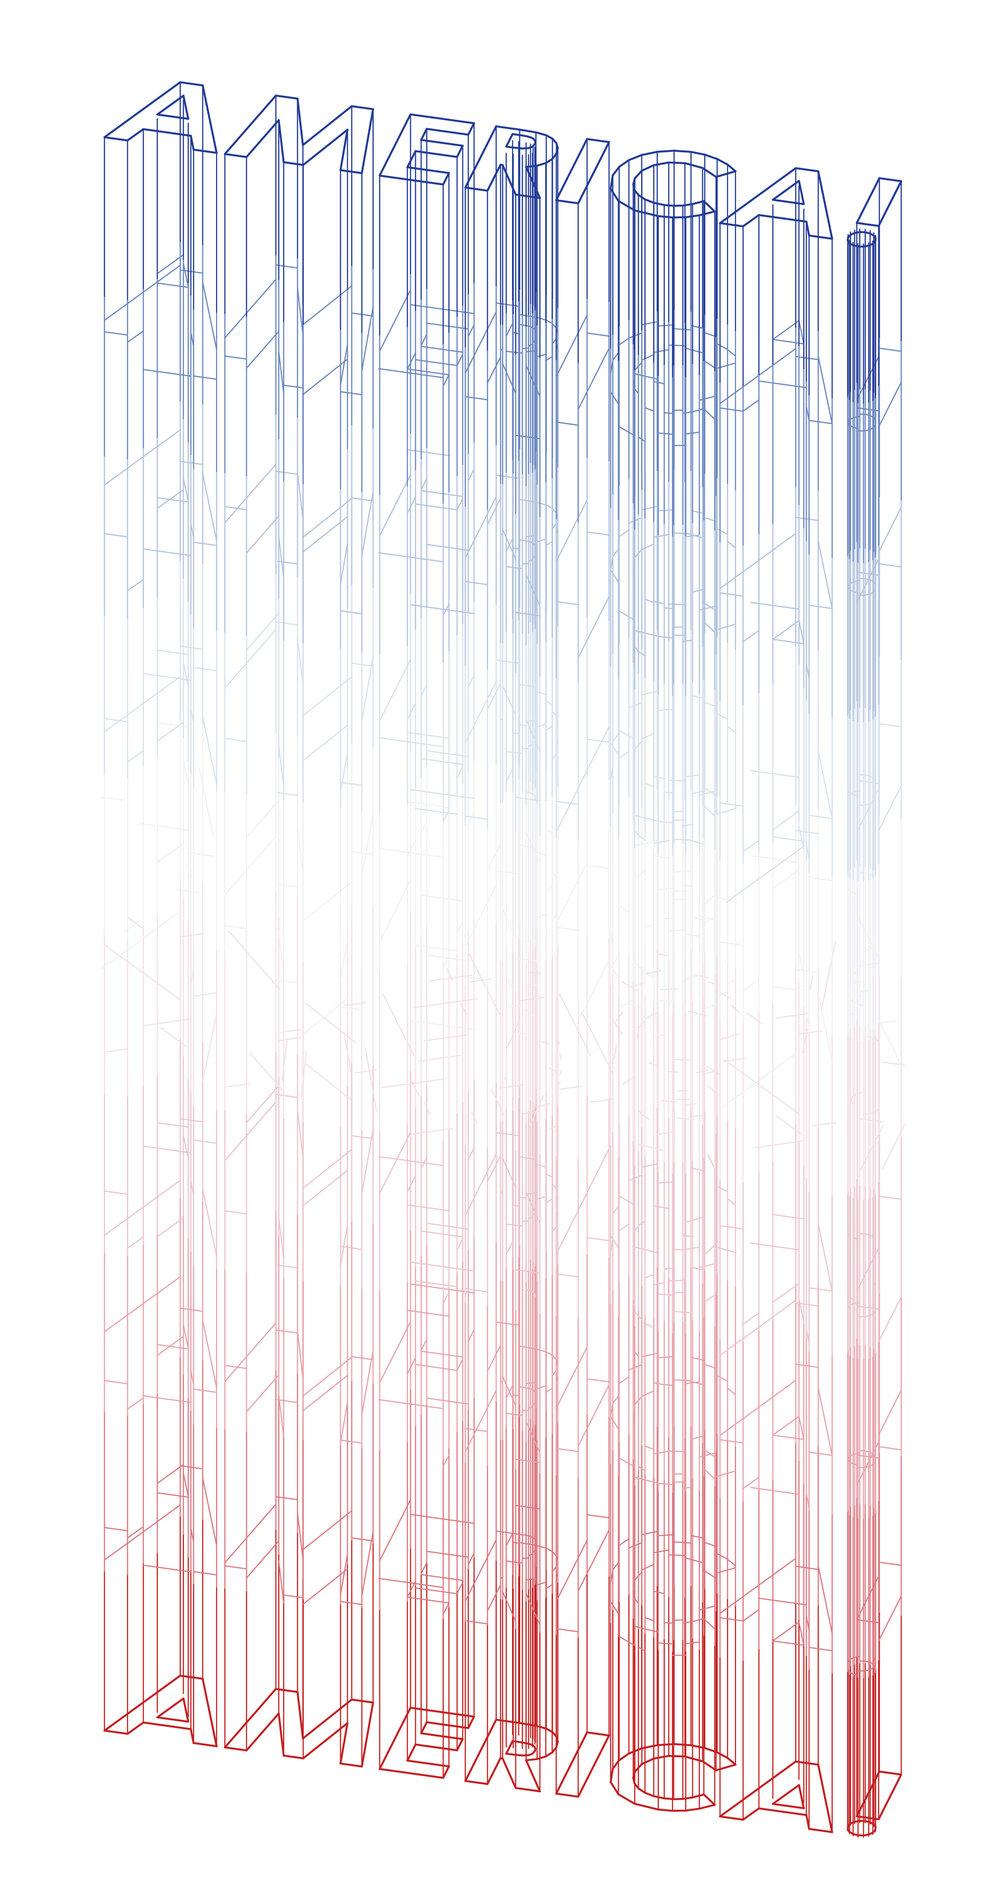 AMERICA_1b_PTCTURE_Small_web.jpg